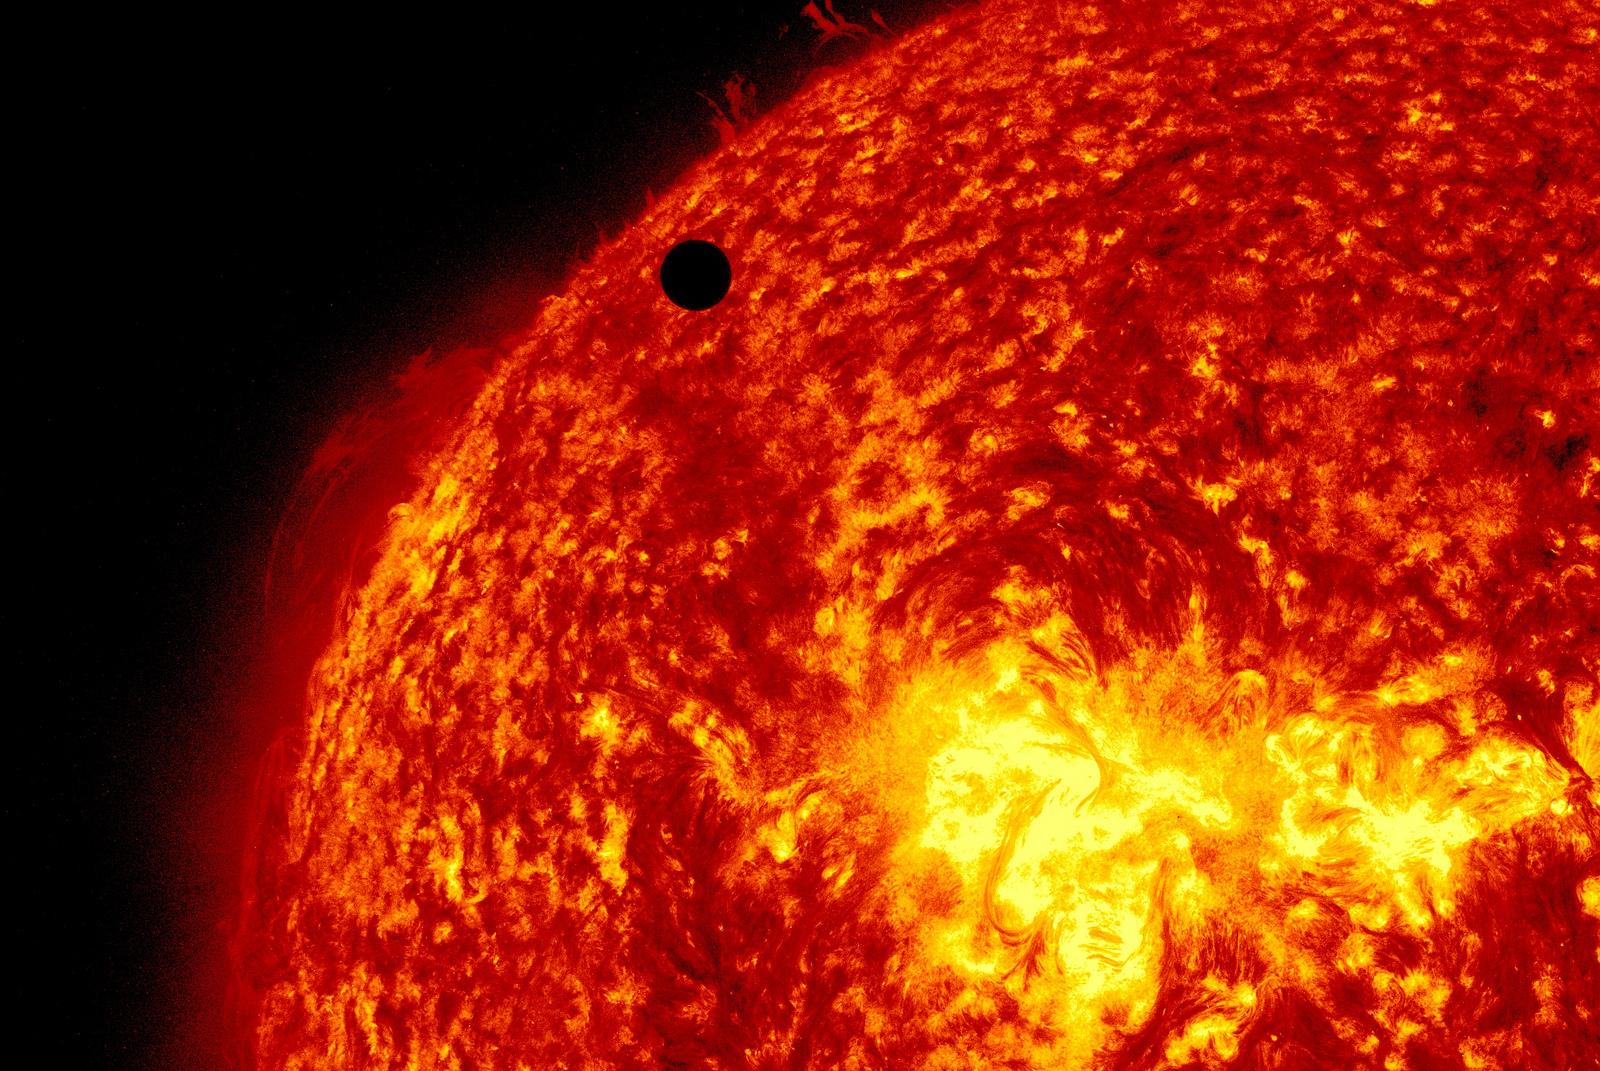 Venus Transit 2012: SDO Closeup